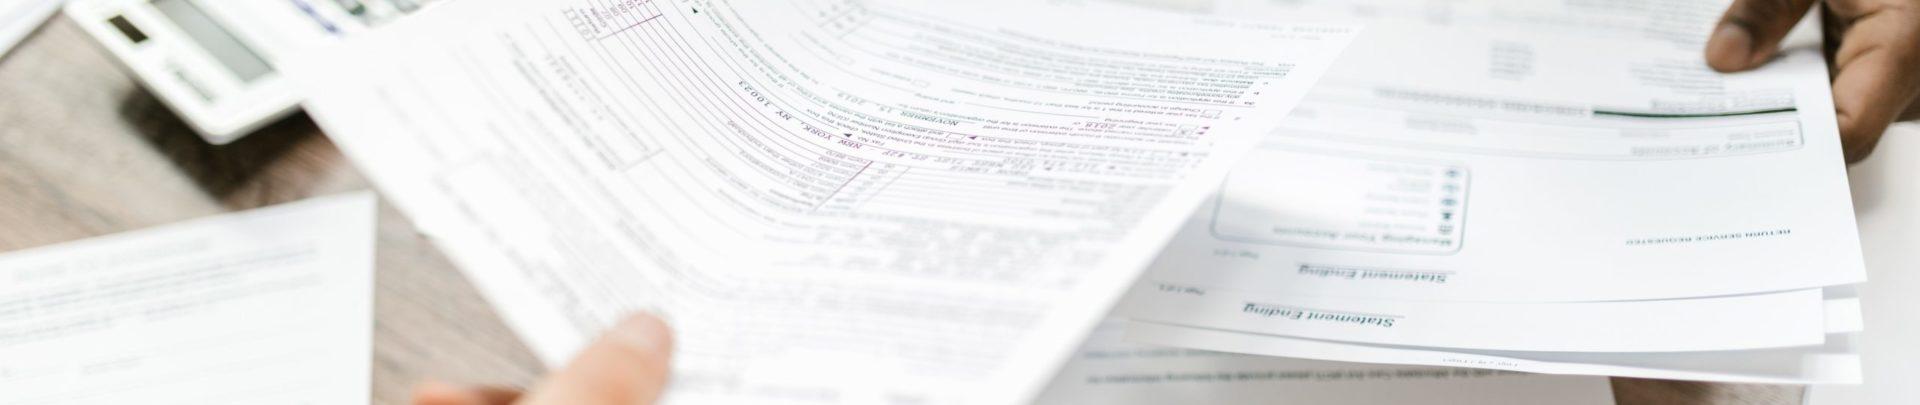 Papierdokumente